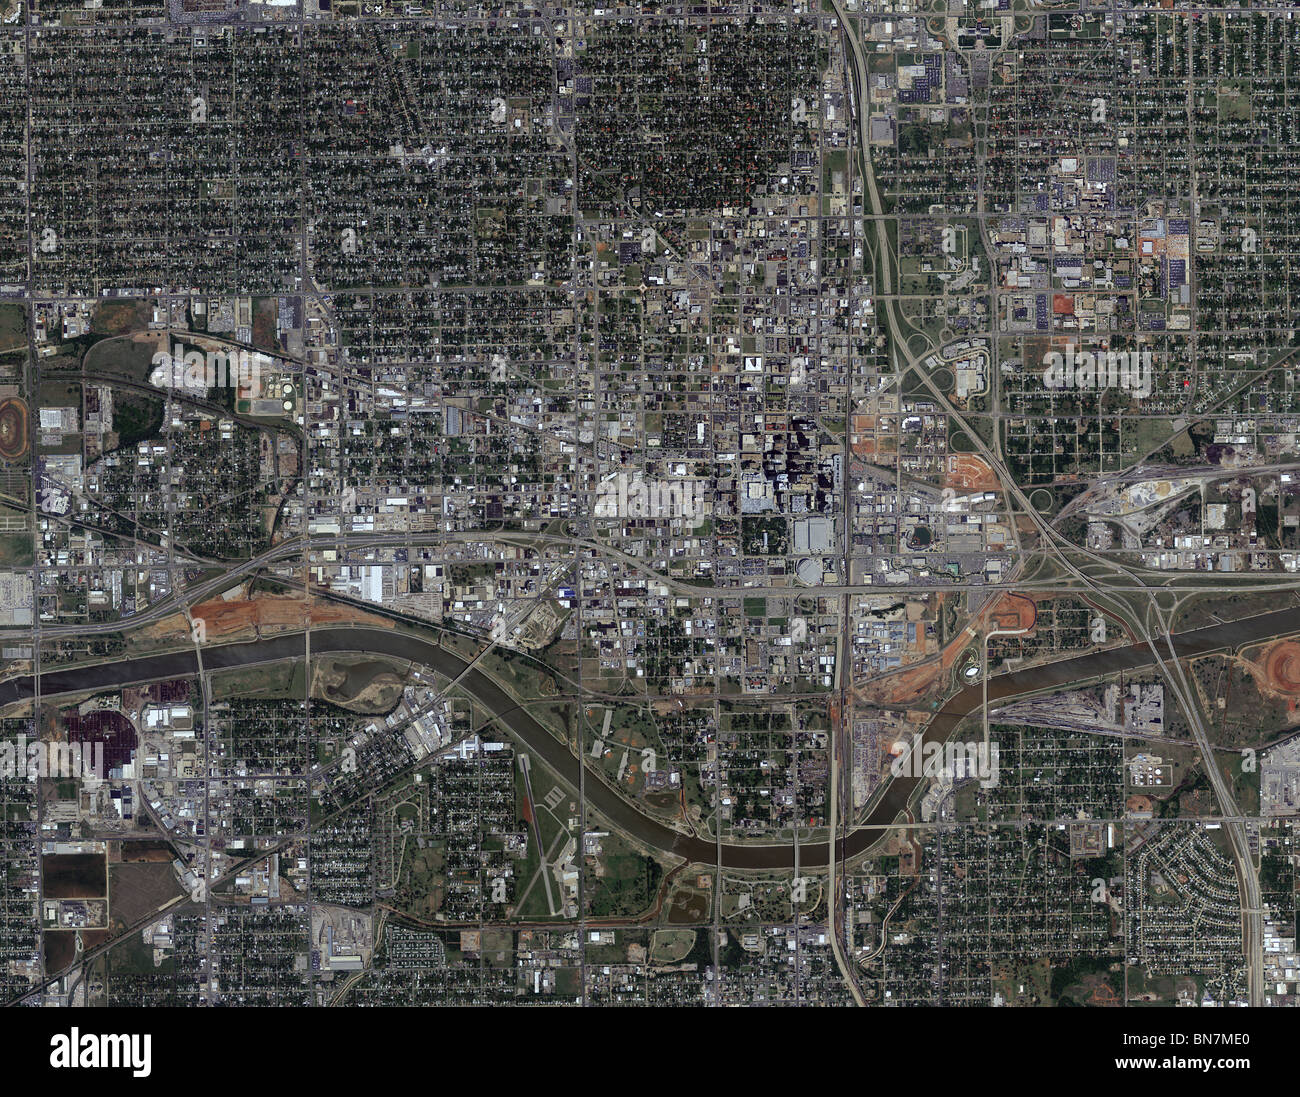 aerial map view above Oklahoma City river Stock Photo ... on a map of oklahoma, weather of oklahoma, world map of oklahoma, contour map of oklahoma, green map of oklahoma, detailed map of oklahoma, county map of oklahoma, physical map of oklahoma, aerial view of tulsa oklahoma, winds of oklahoma, aerial map of edmond oklahoma, seismic map of oklahoma, the map of oklahoma, hd map of oklahoma, topo map of oklahoma, elevation of oklahoma, street map of oklahoma, osage nation of oklahoma, pdf map of oklahoma, google maps oklahoma,